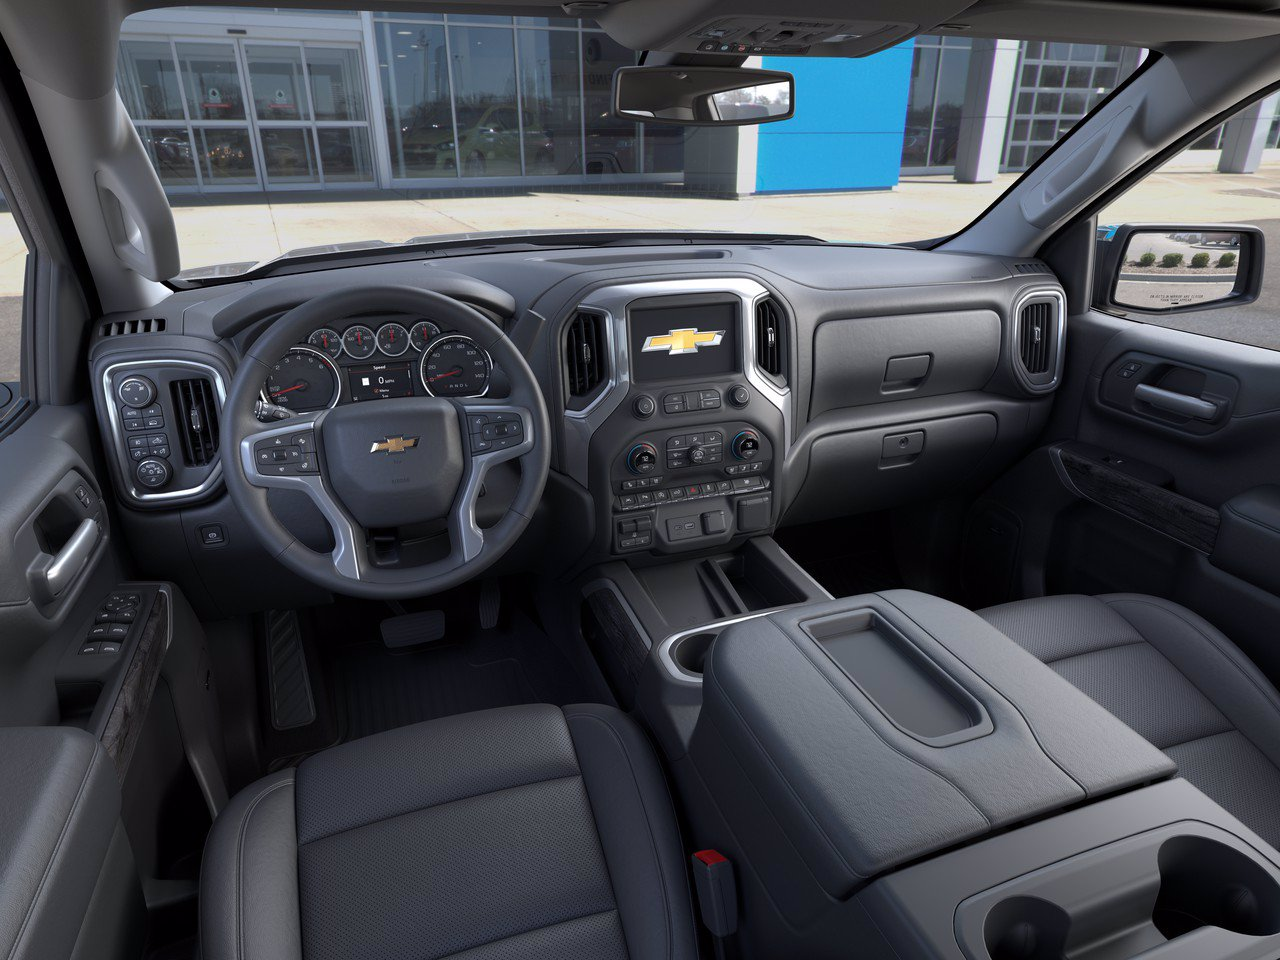 2020 Chevrolet Silverado 1500 Crew Cab 4x4, Pickup #C201707 - photo 10